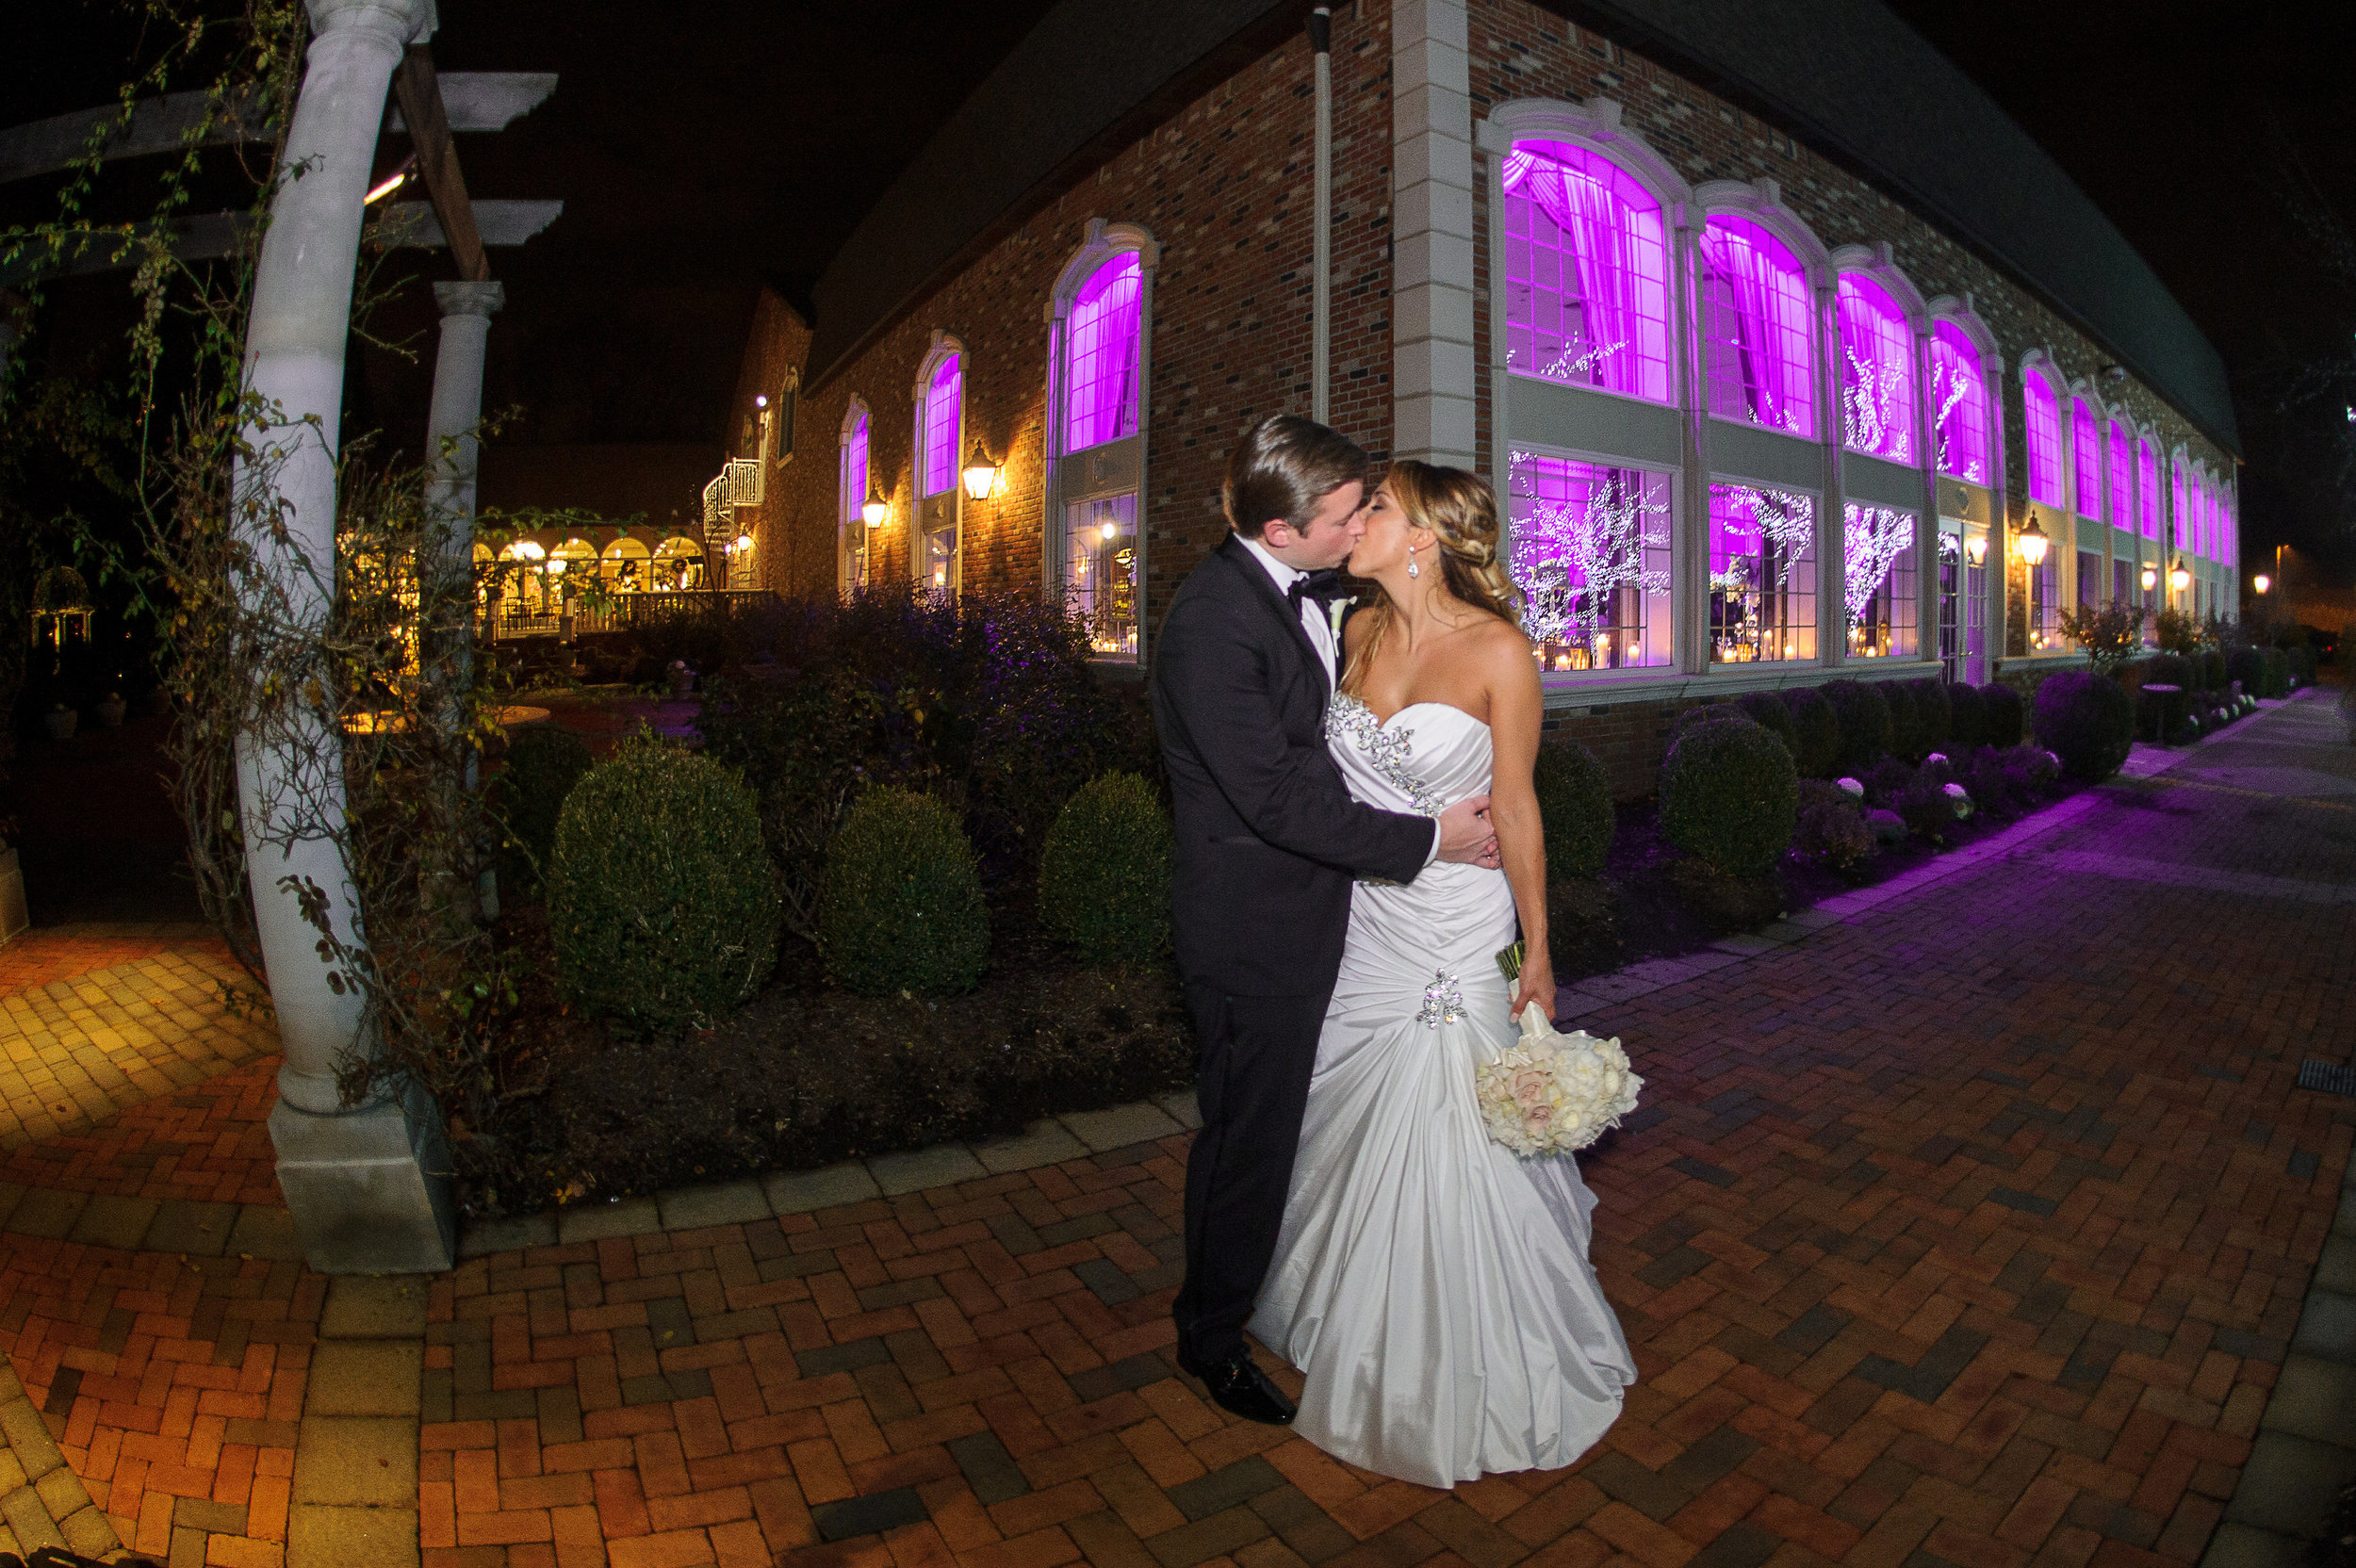 Ceci_New_York_Custom_Invitation_ New_Jersey_Wedding_Luxury_Personalized_Ceci_Style_Bride_Foil_Stamping126.JPG